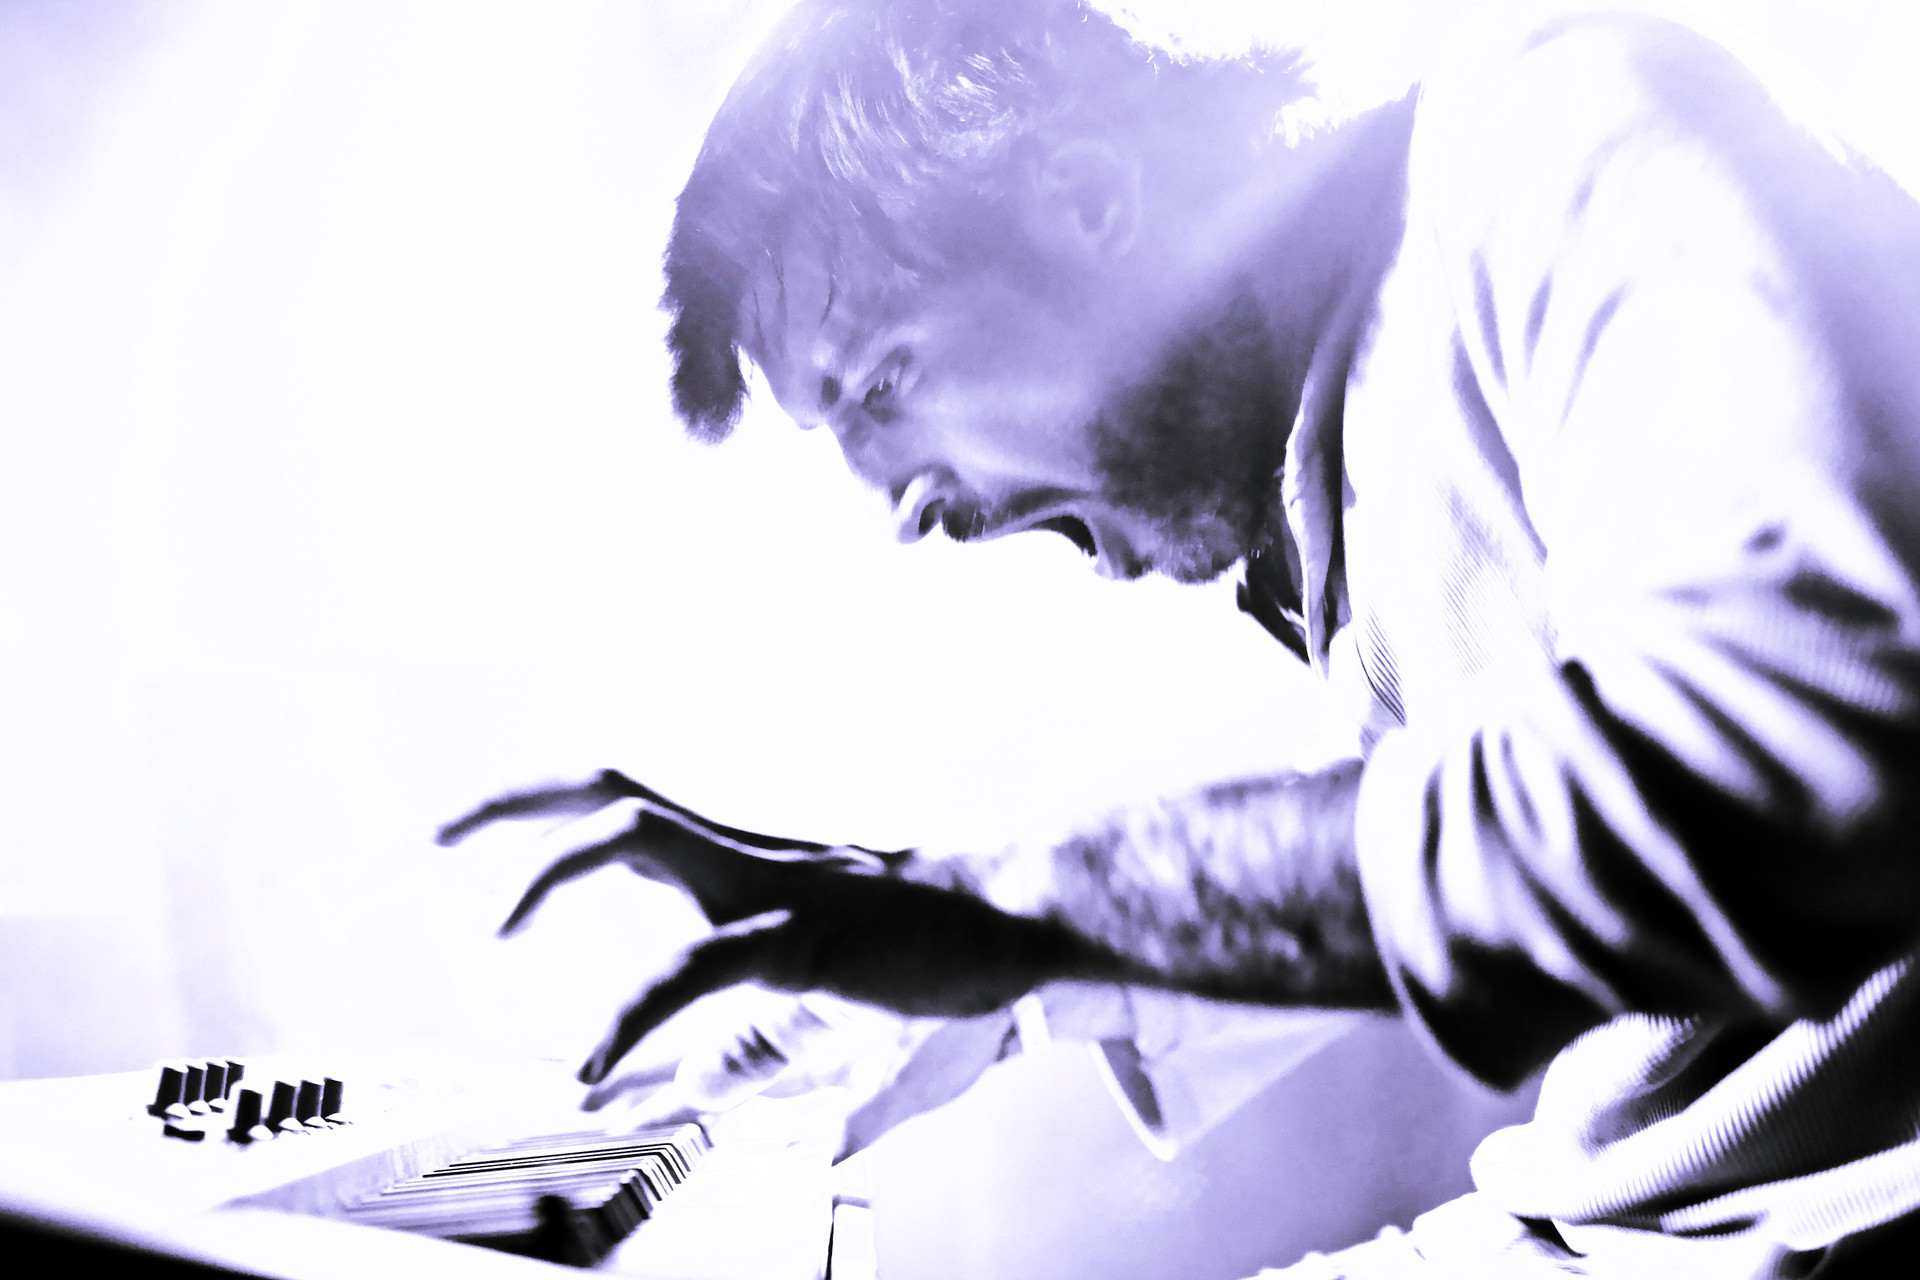 Kertone Production - Jerkov Musiques - My Own Private Alaska (MOPA) - Tristan Mocquet - Photo Live Concert